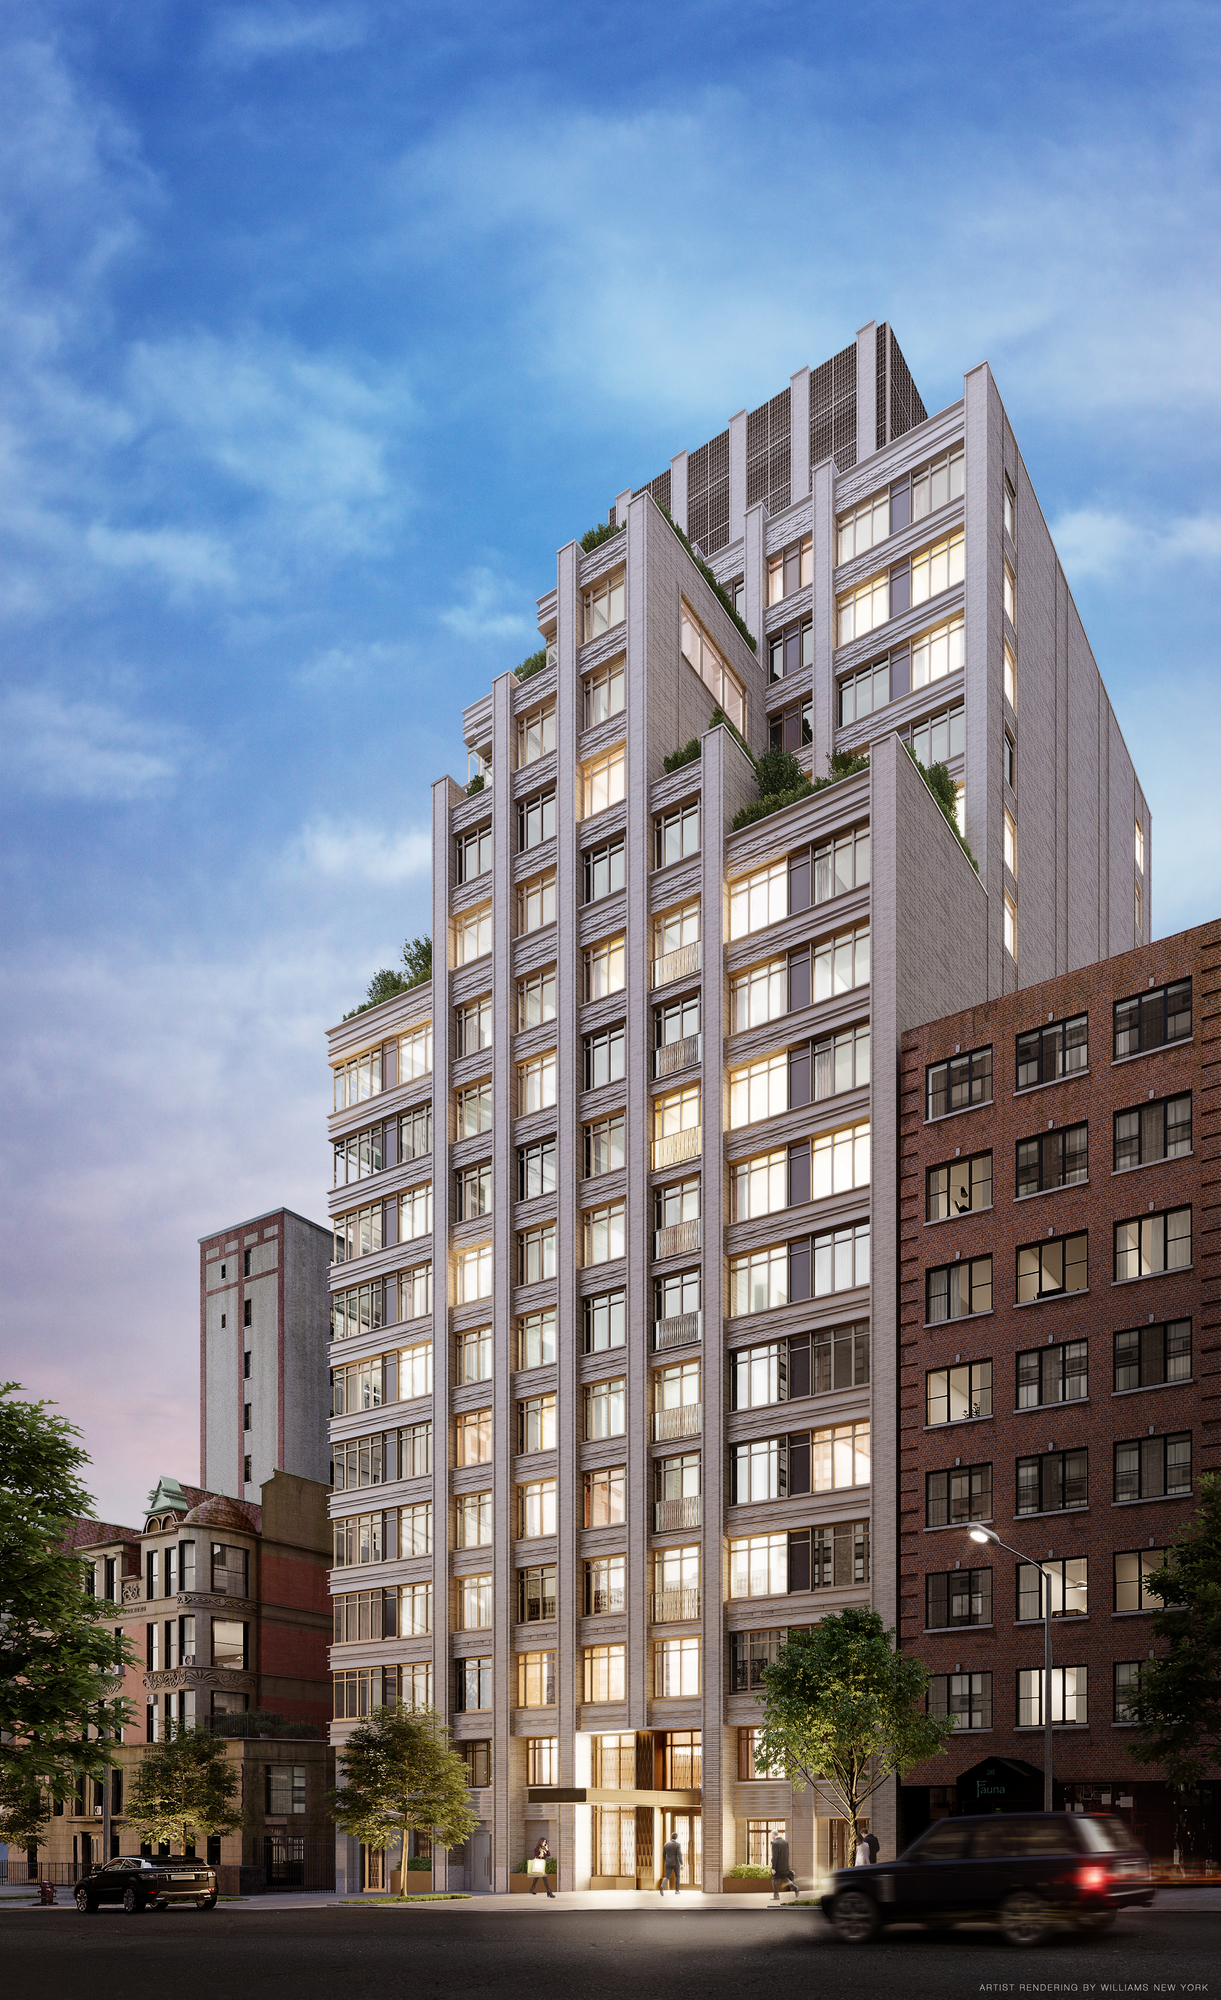 269 West 87th Street